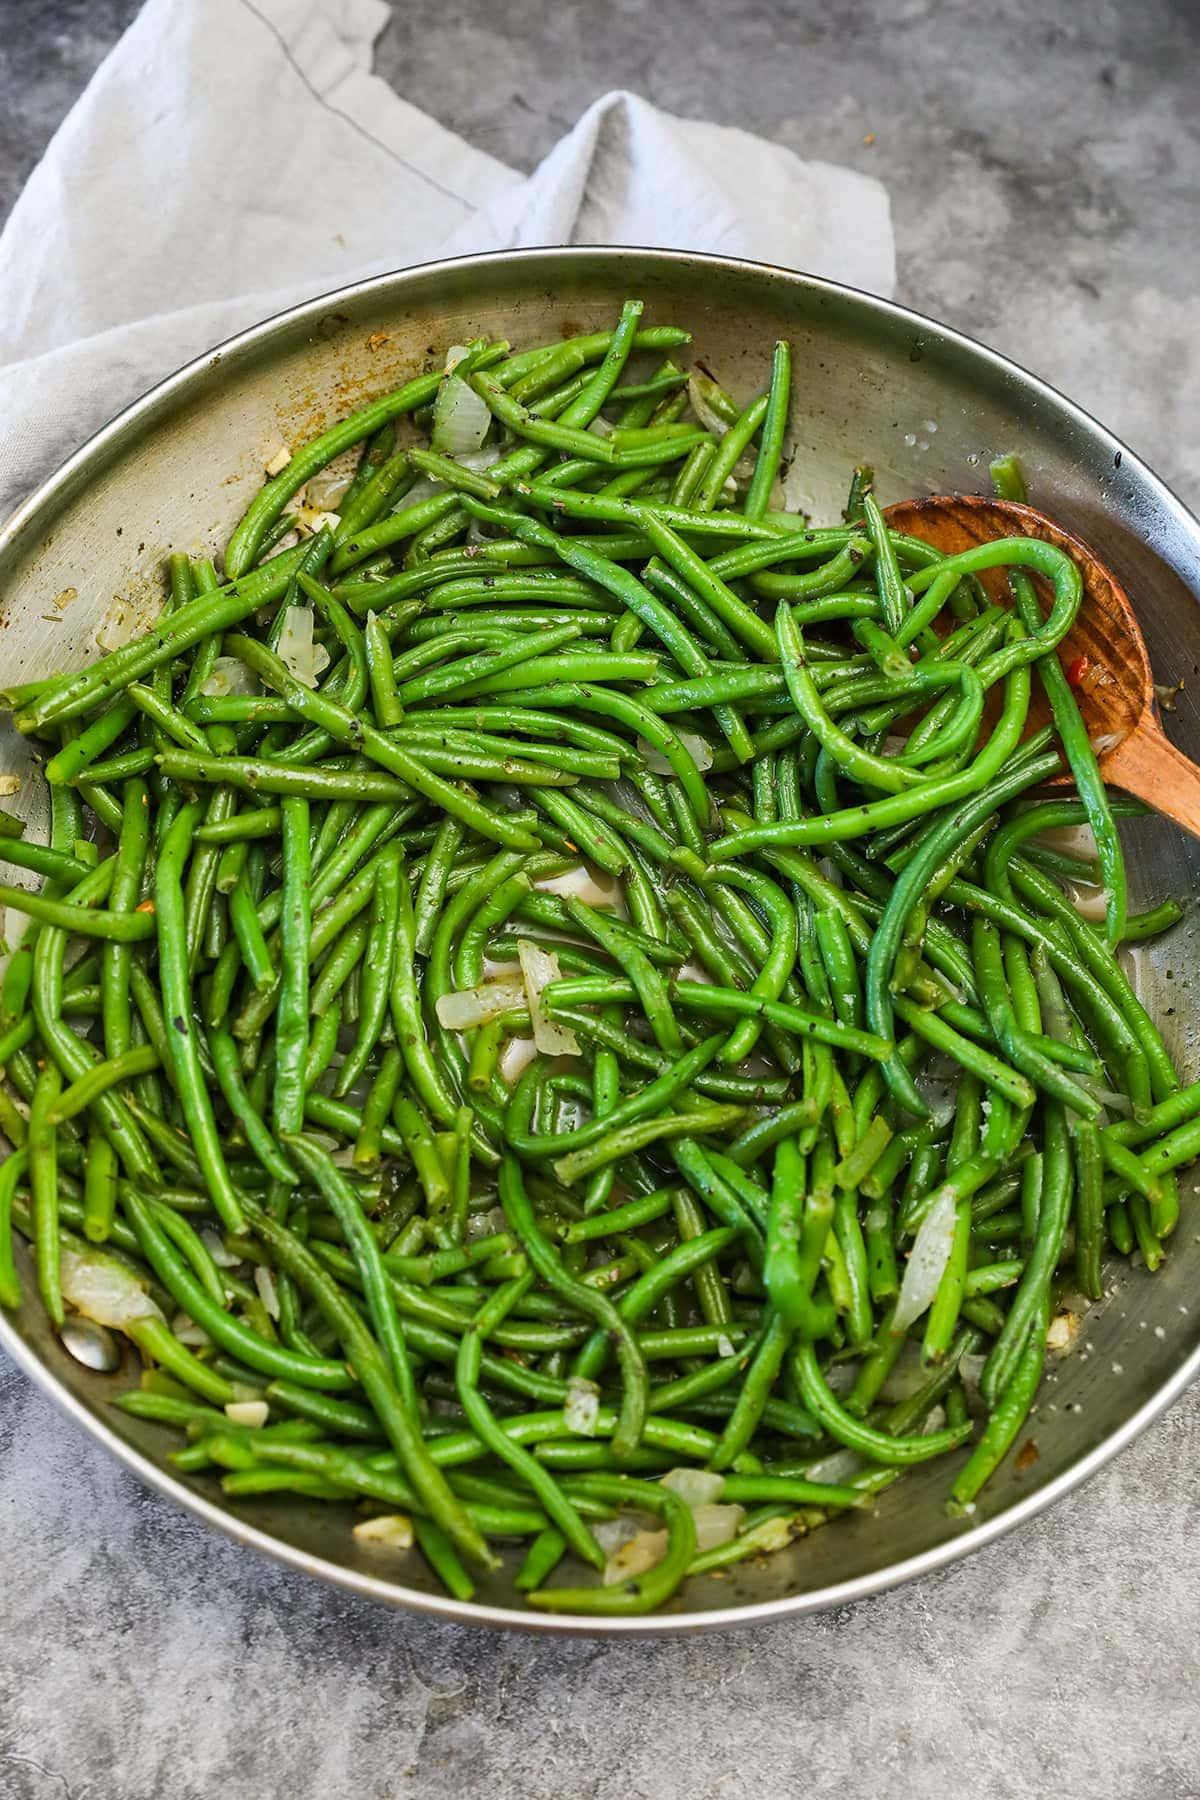 frozen green beans in skillet on grey background